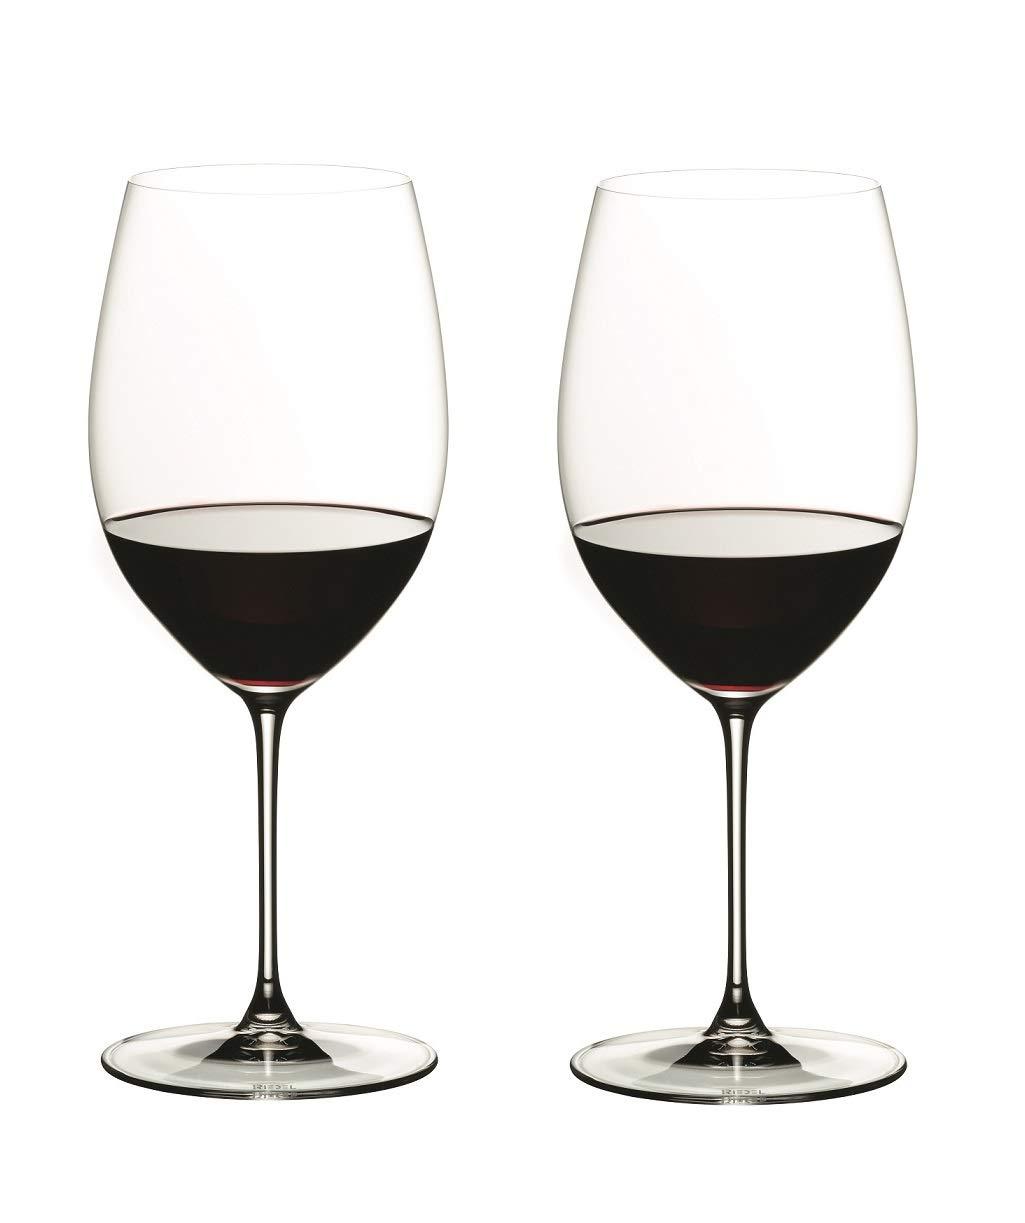 Riedel 6449/0 Veritas Cabernet/Merlot Wine Glasses, Set of 2, Clear by Riedel (Image #1)